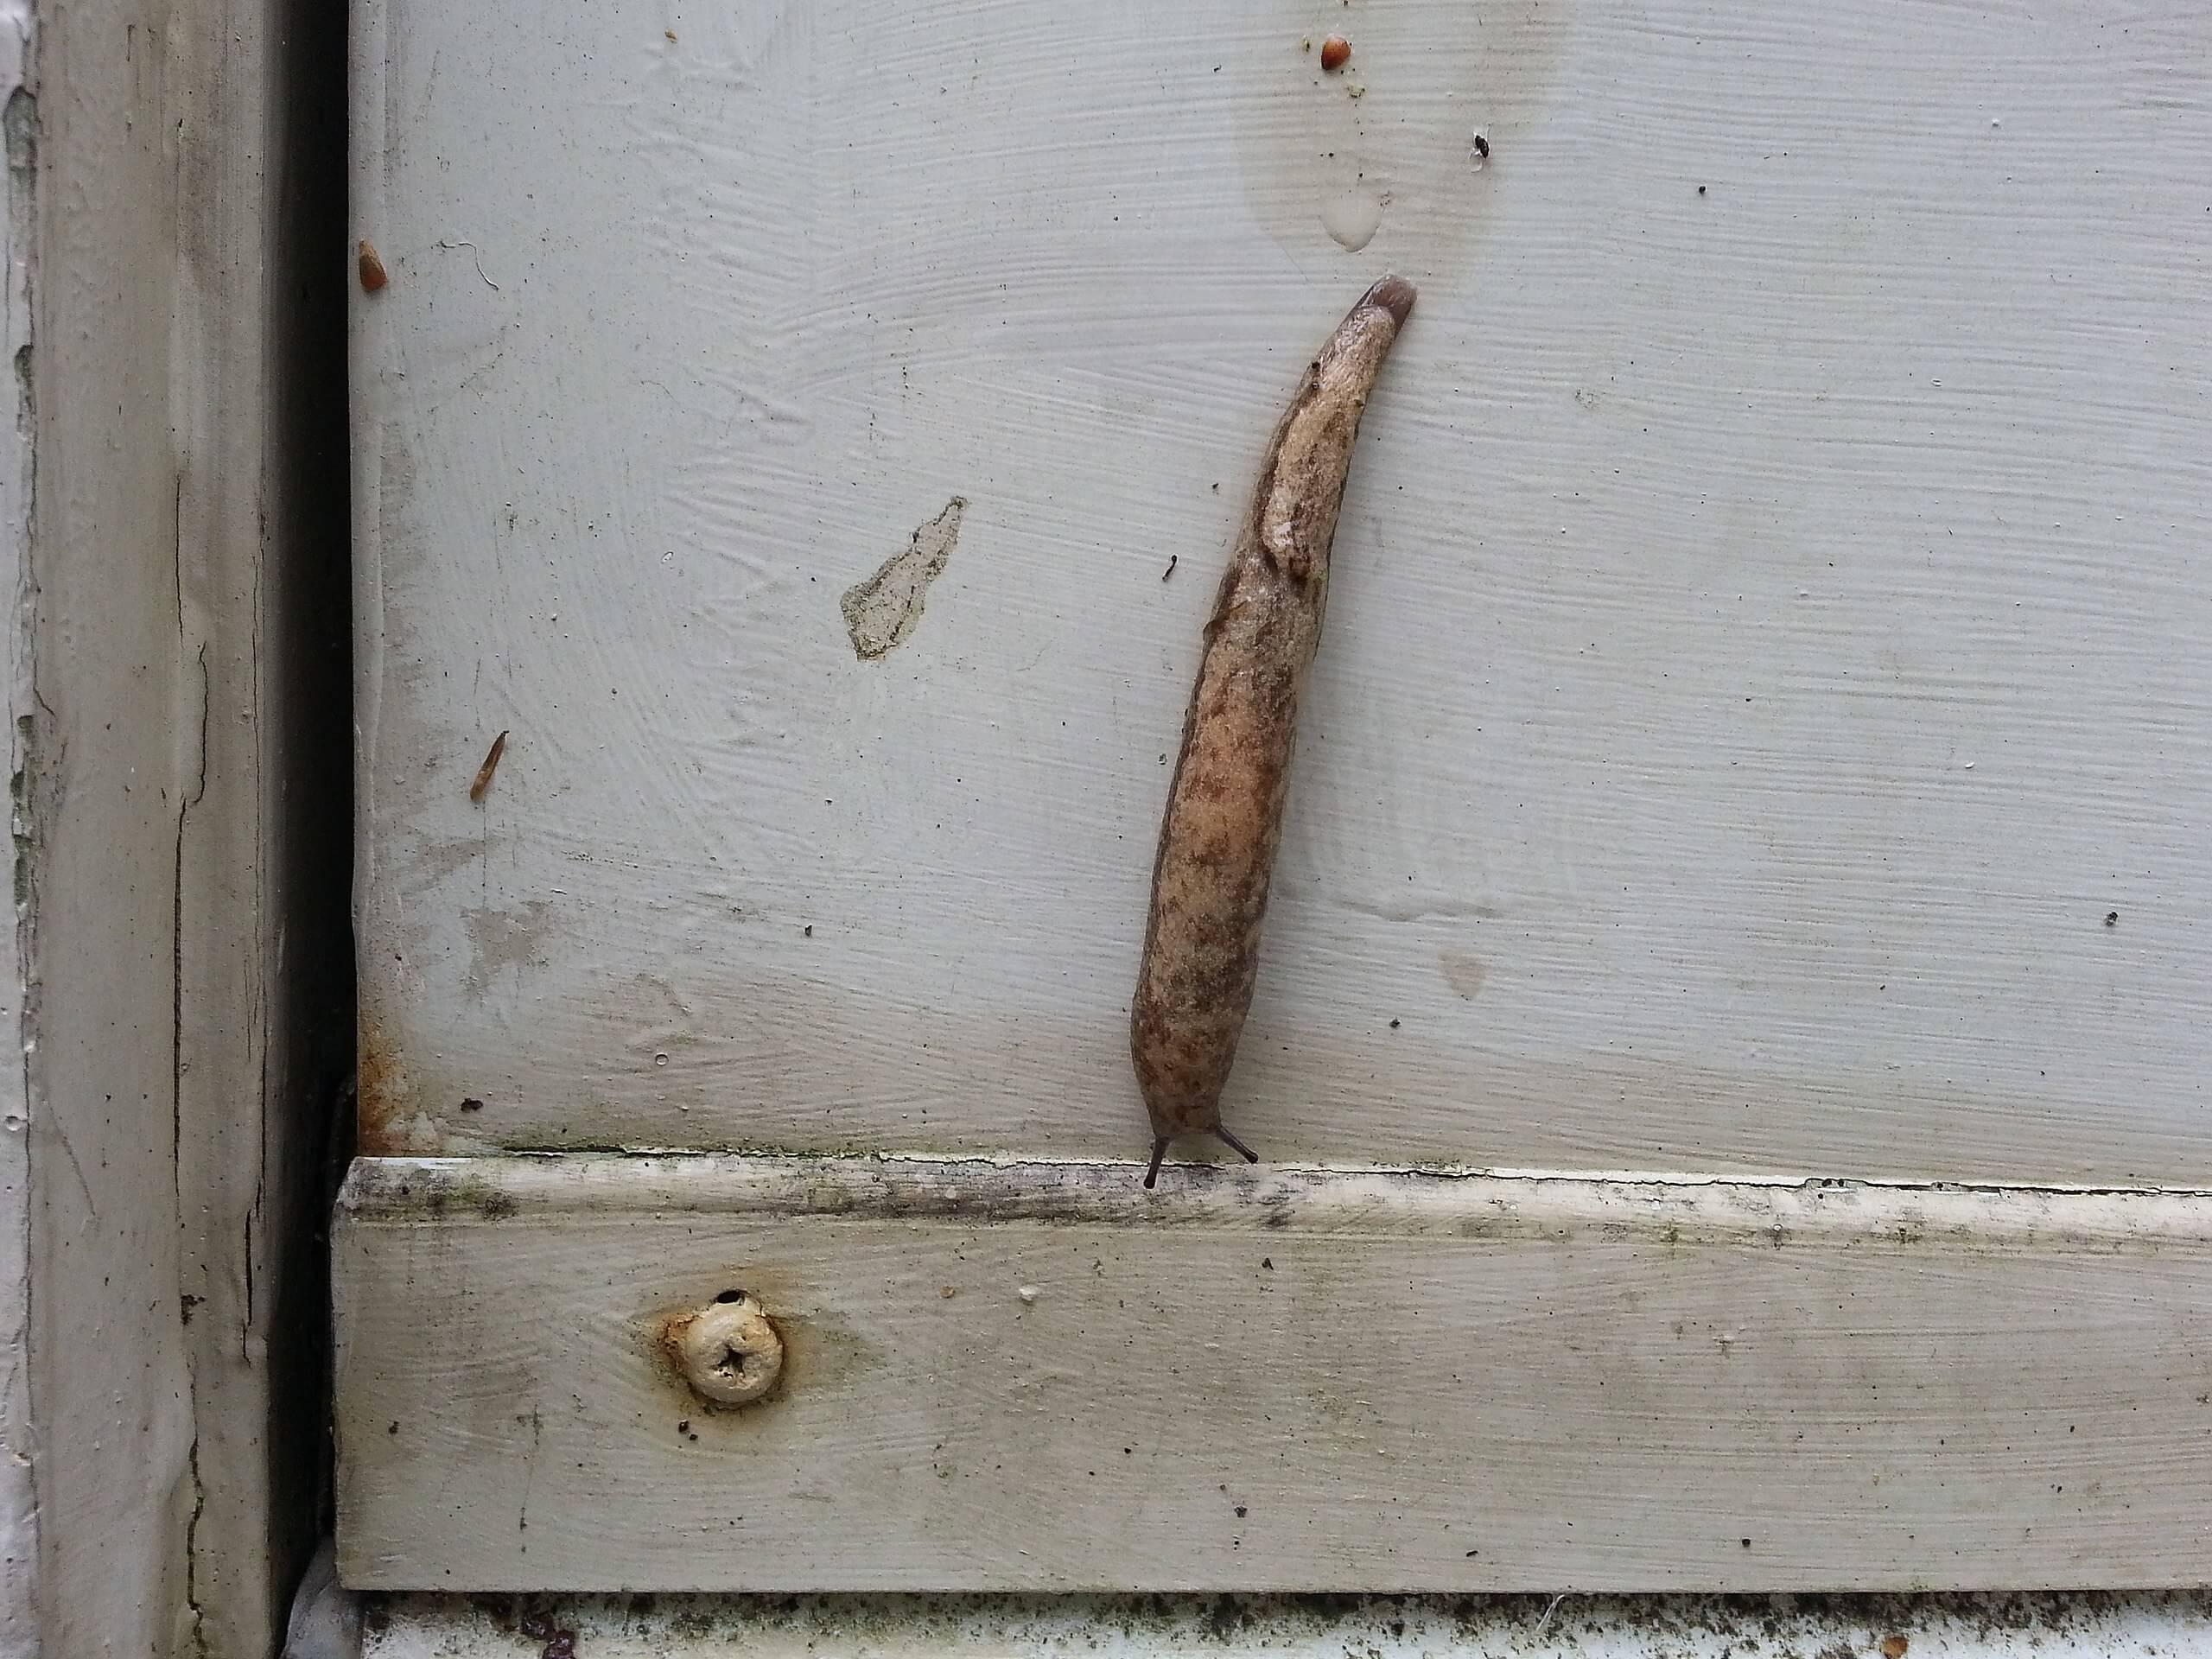 The Carolina Mantleslug Slug On a Door